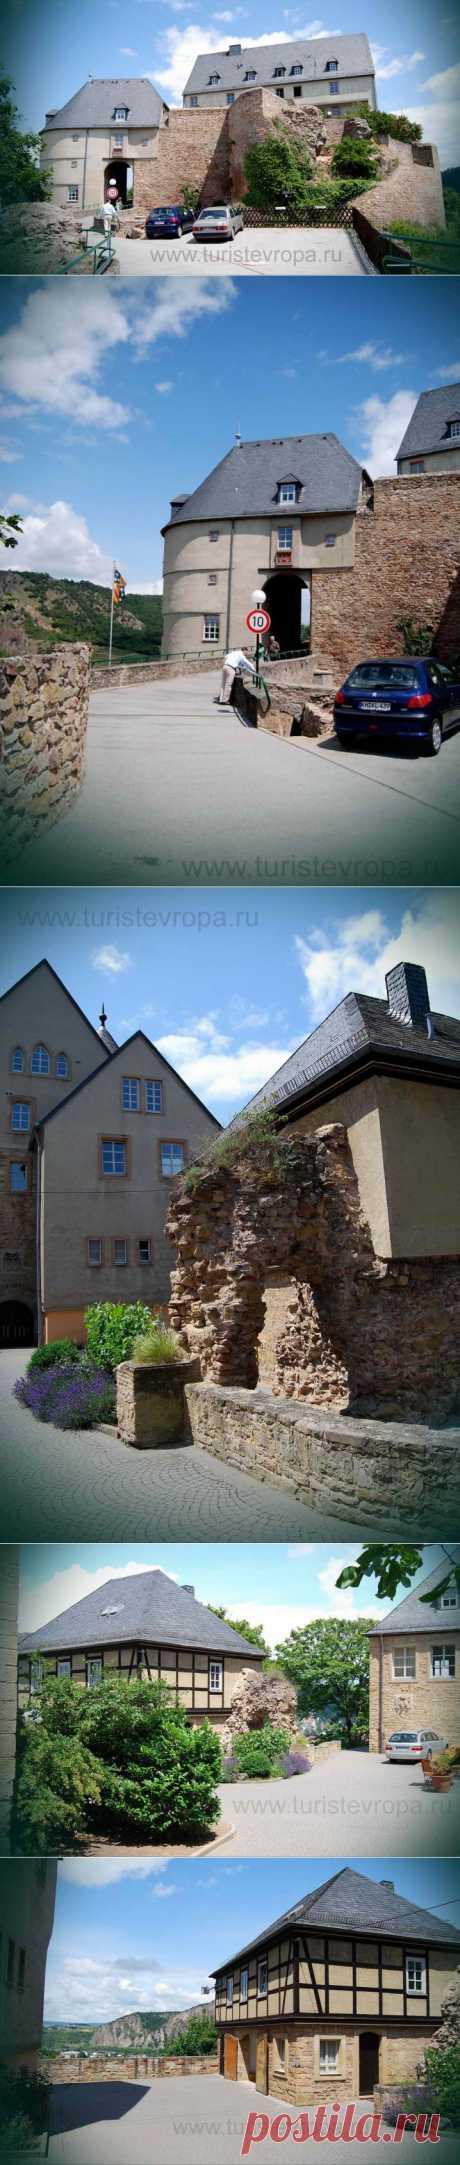 Замок Эбернбург Ebernburg кабан легенда спектакль осада идея | Туры по Европе